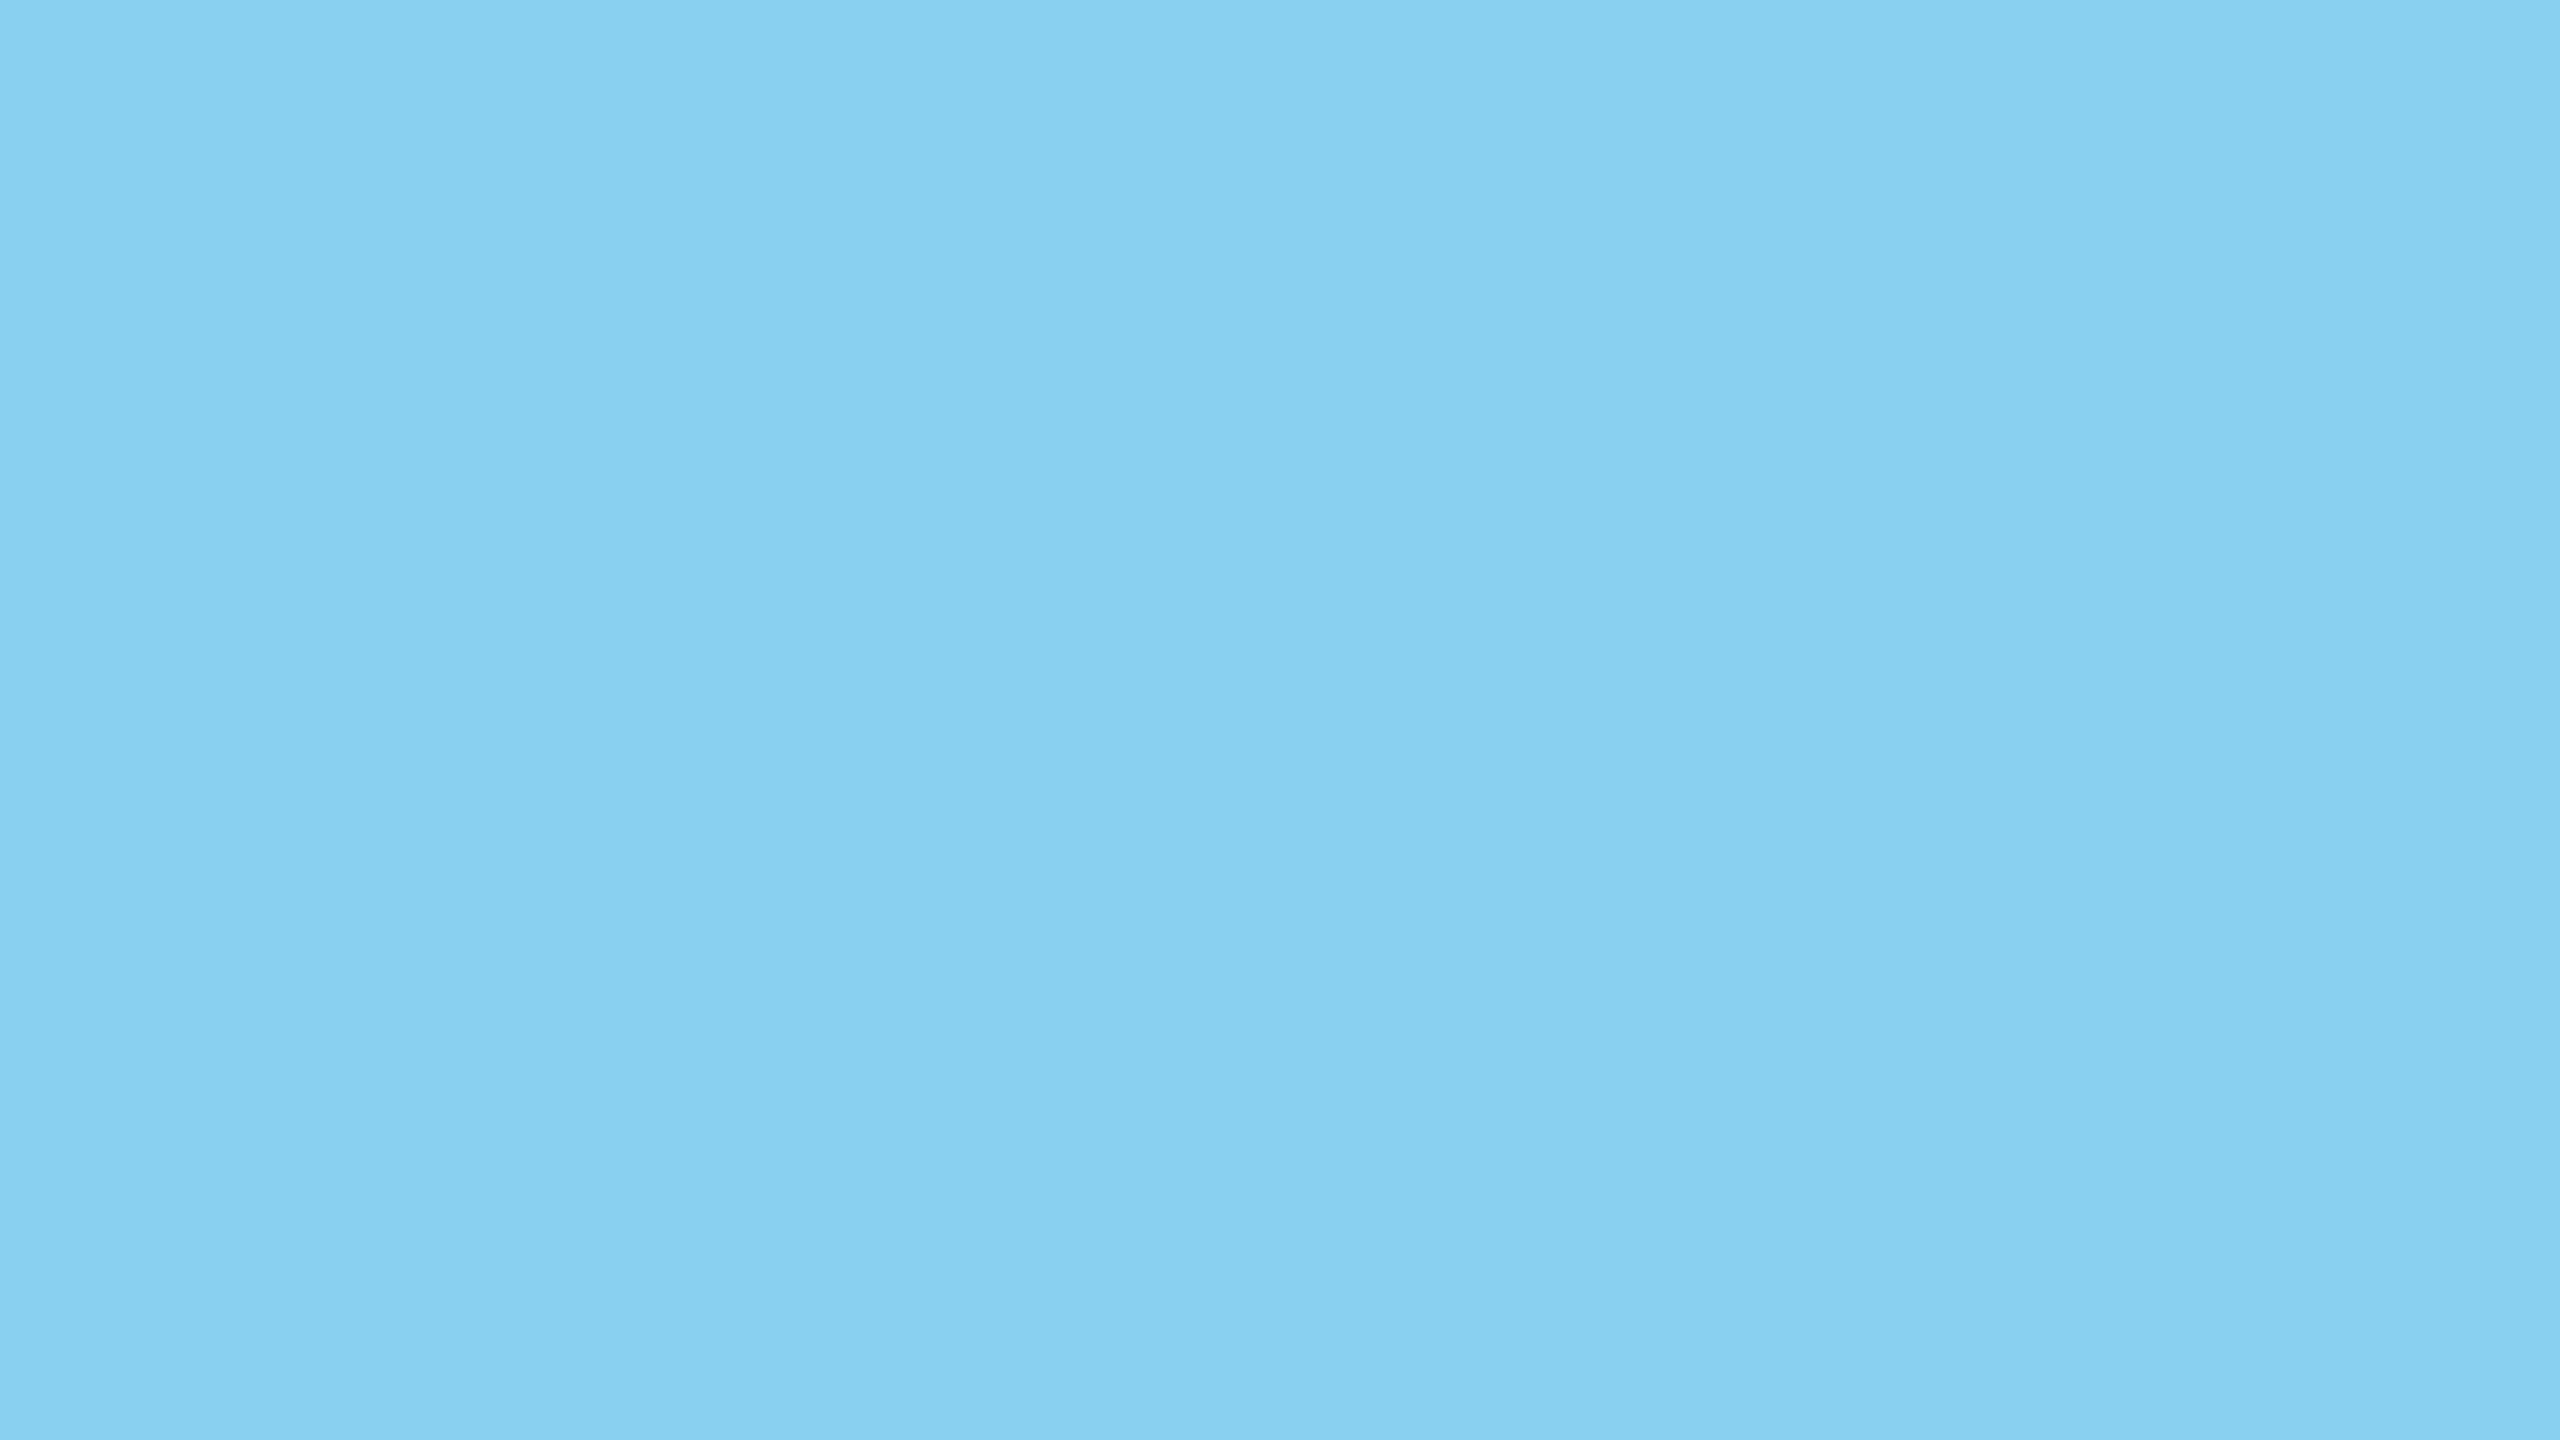 [49+] Baby Blue Wallpaper on WallpaperSafari